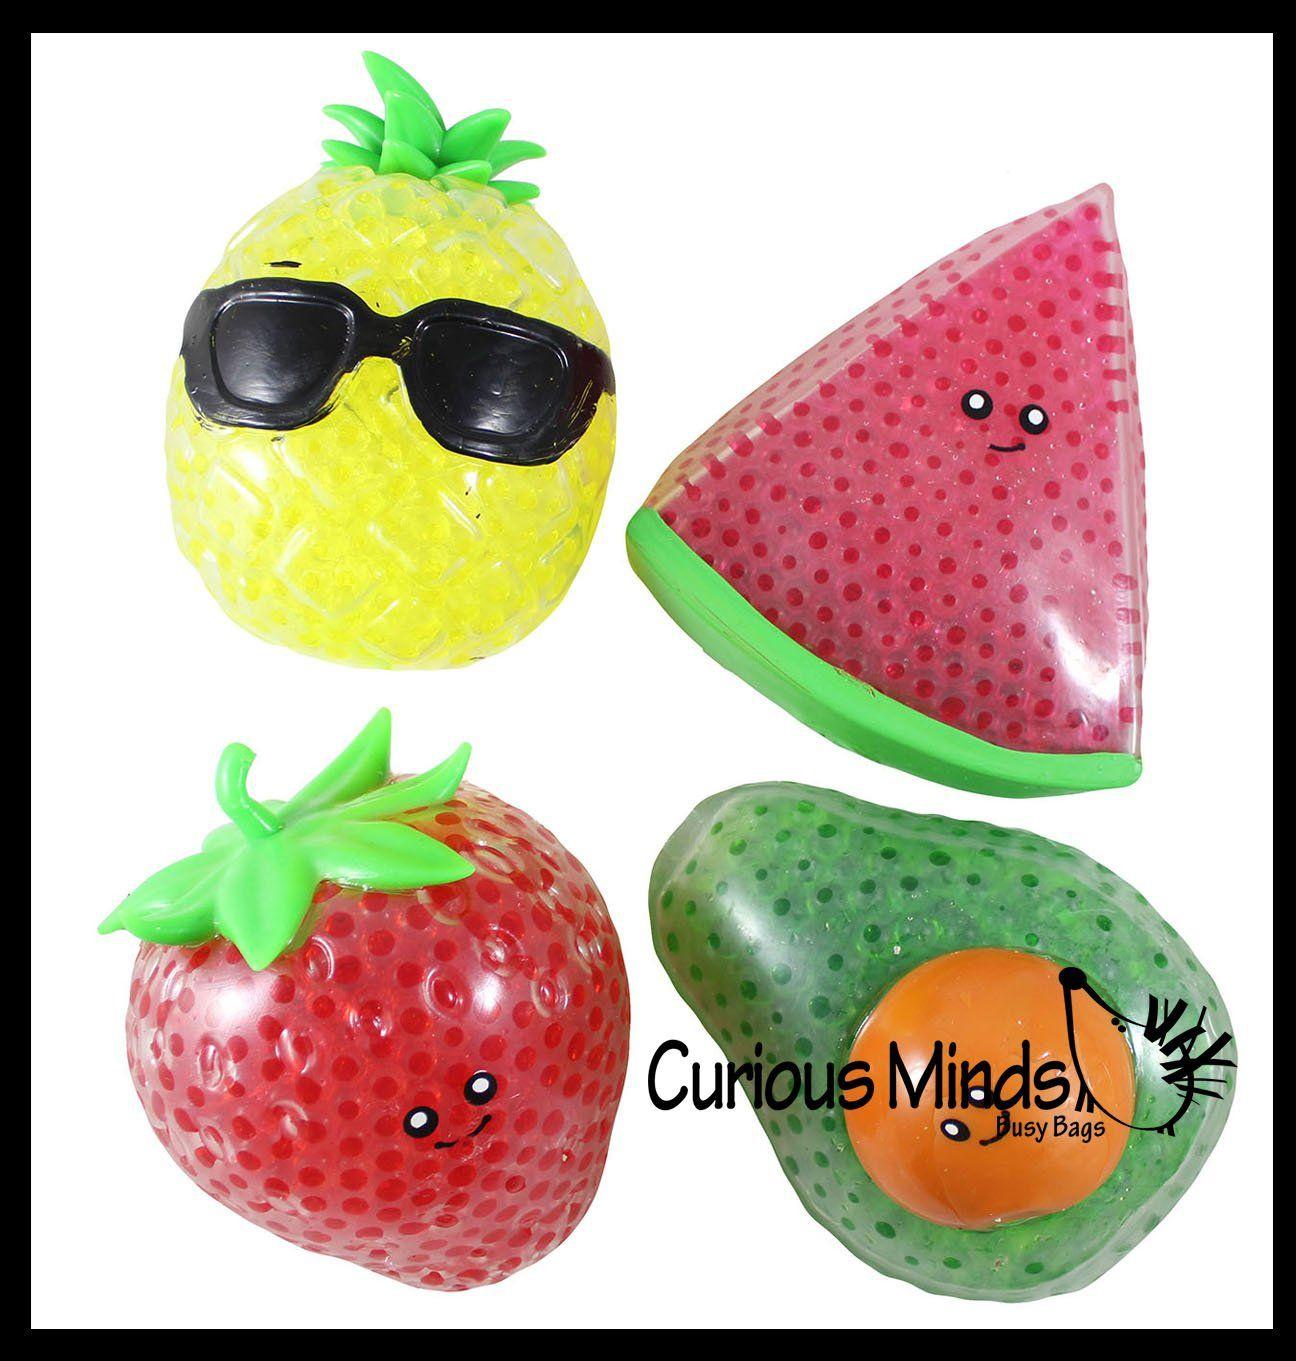 Jumbo Fruit Water Bead Filled Squeeze Stress Balls Sensory Stress Fidget Toy Pineapple Strawberry Avocado Watermelon In 2020 Stress Balls Water Beads Fruit Water